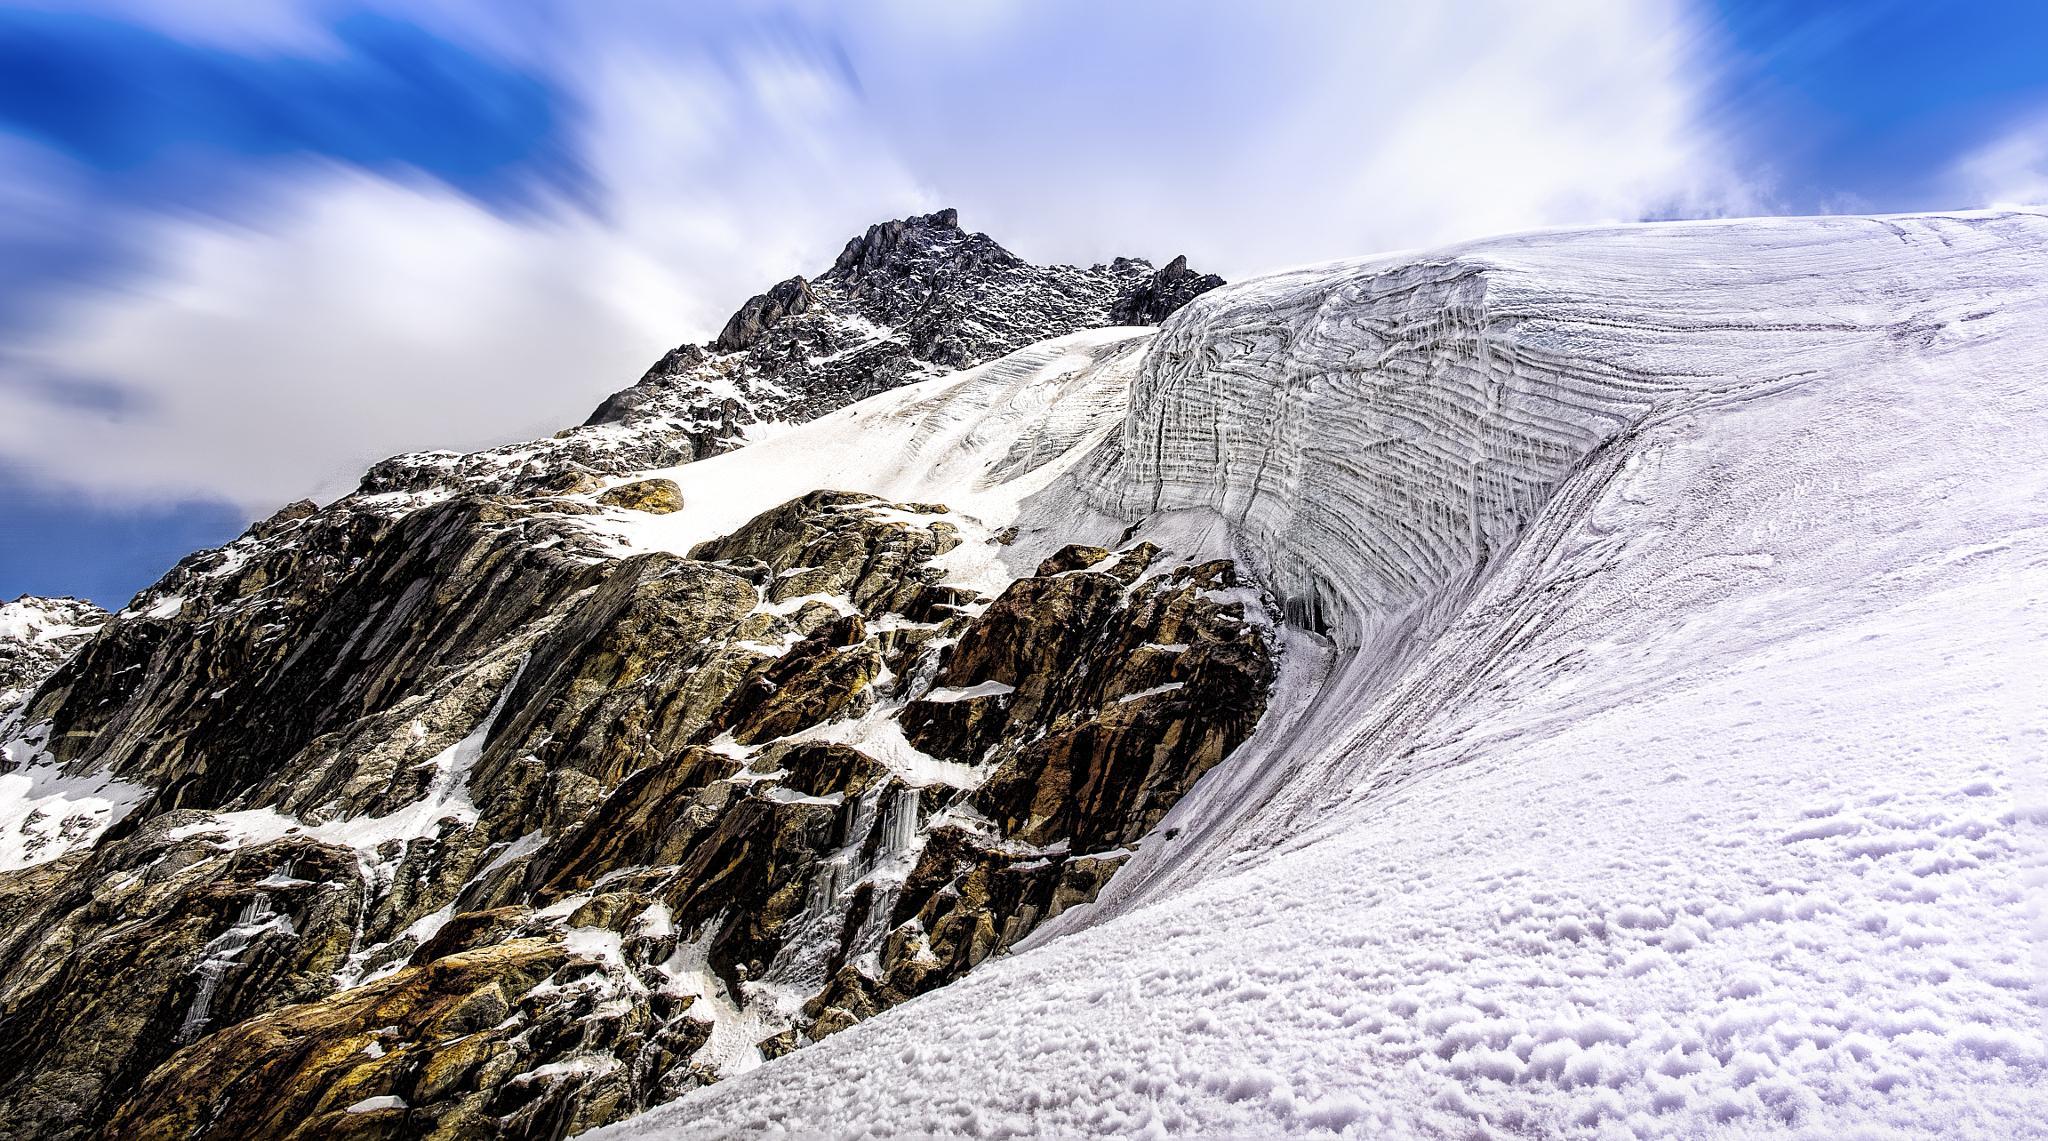 Mountain by Kok Tien Sang